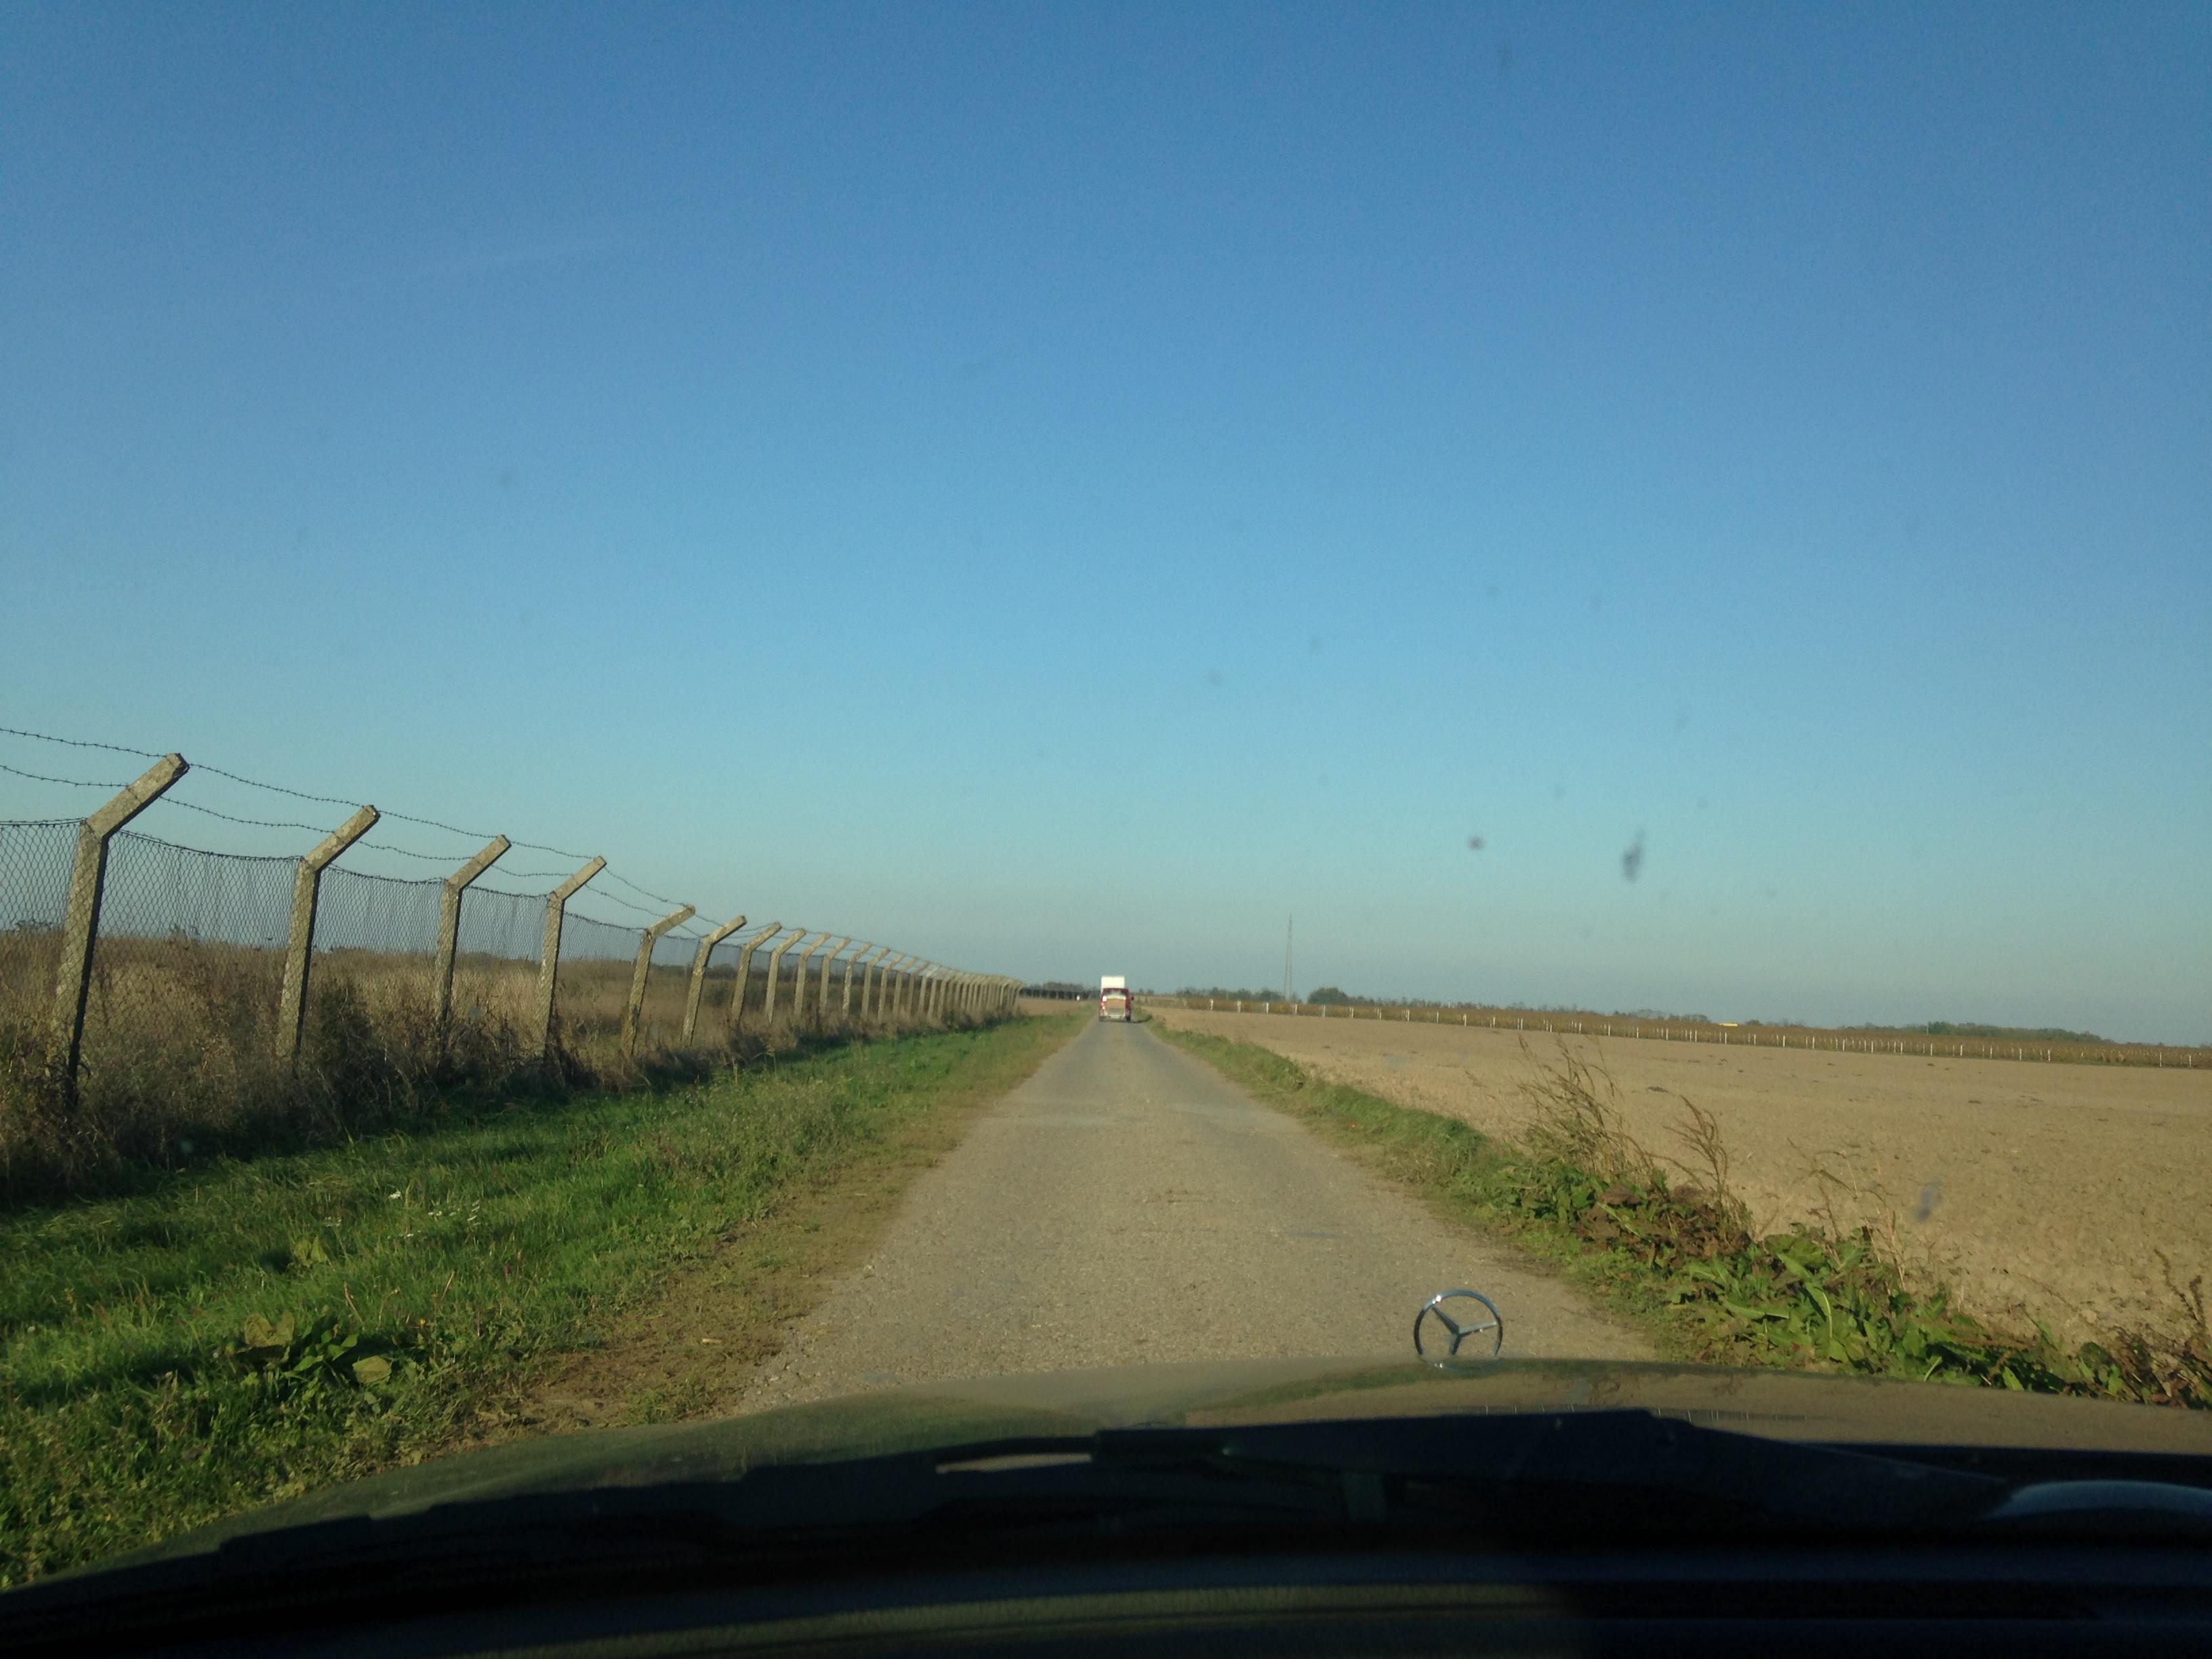 Auf dem Weg nach Slowenien (Foto: Mathias Junkert)